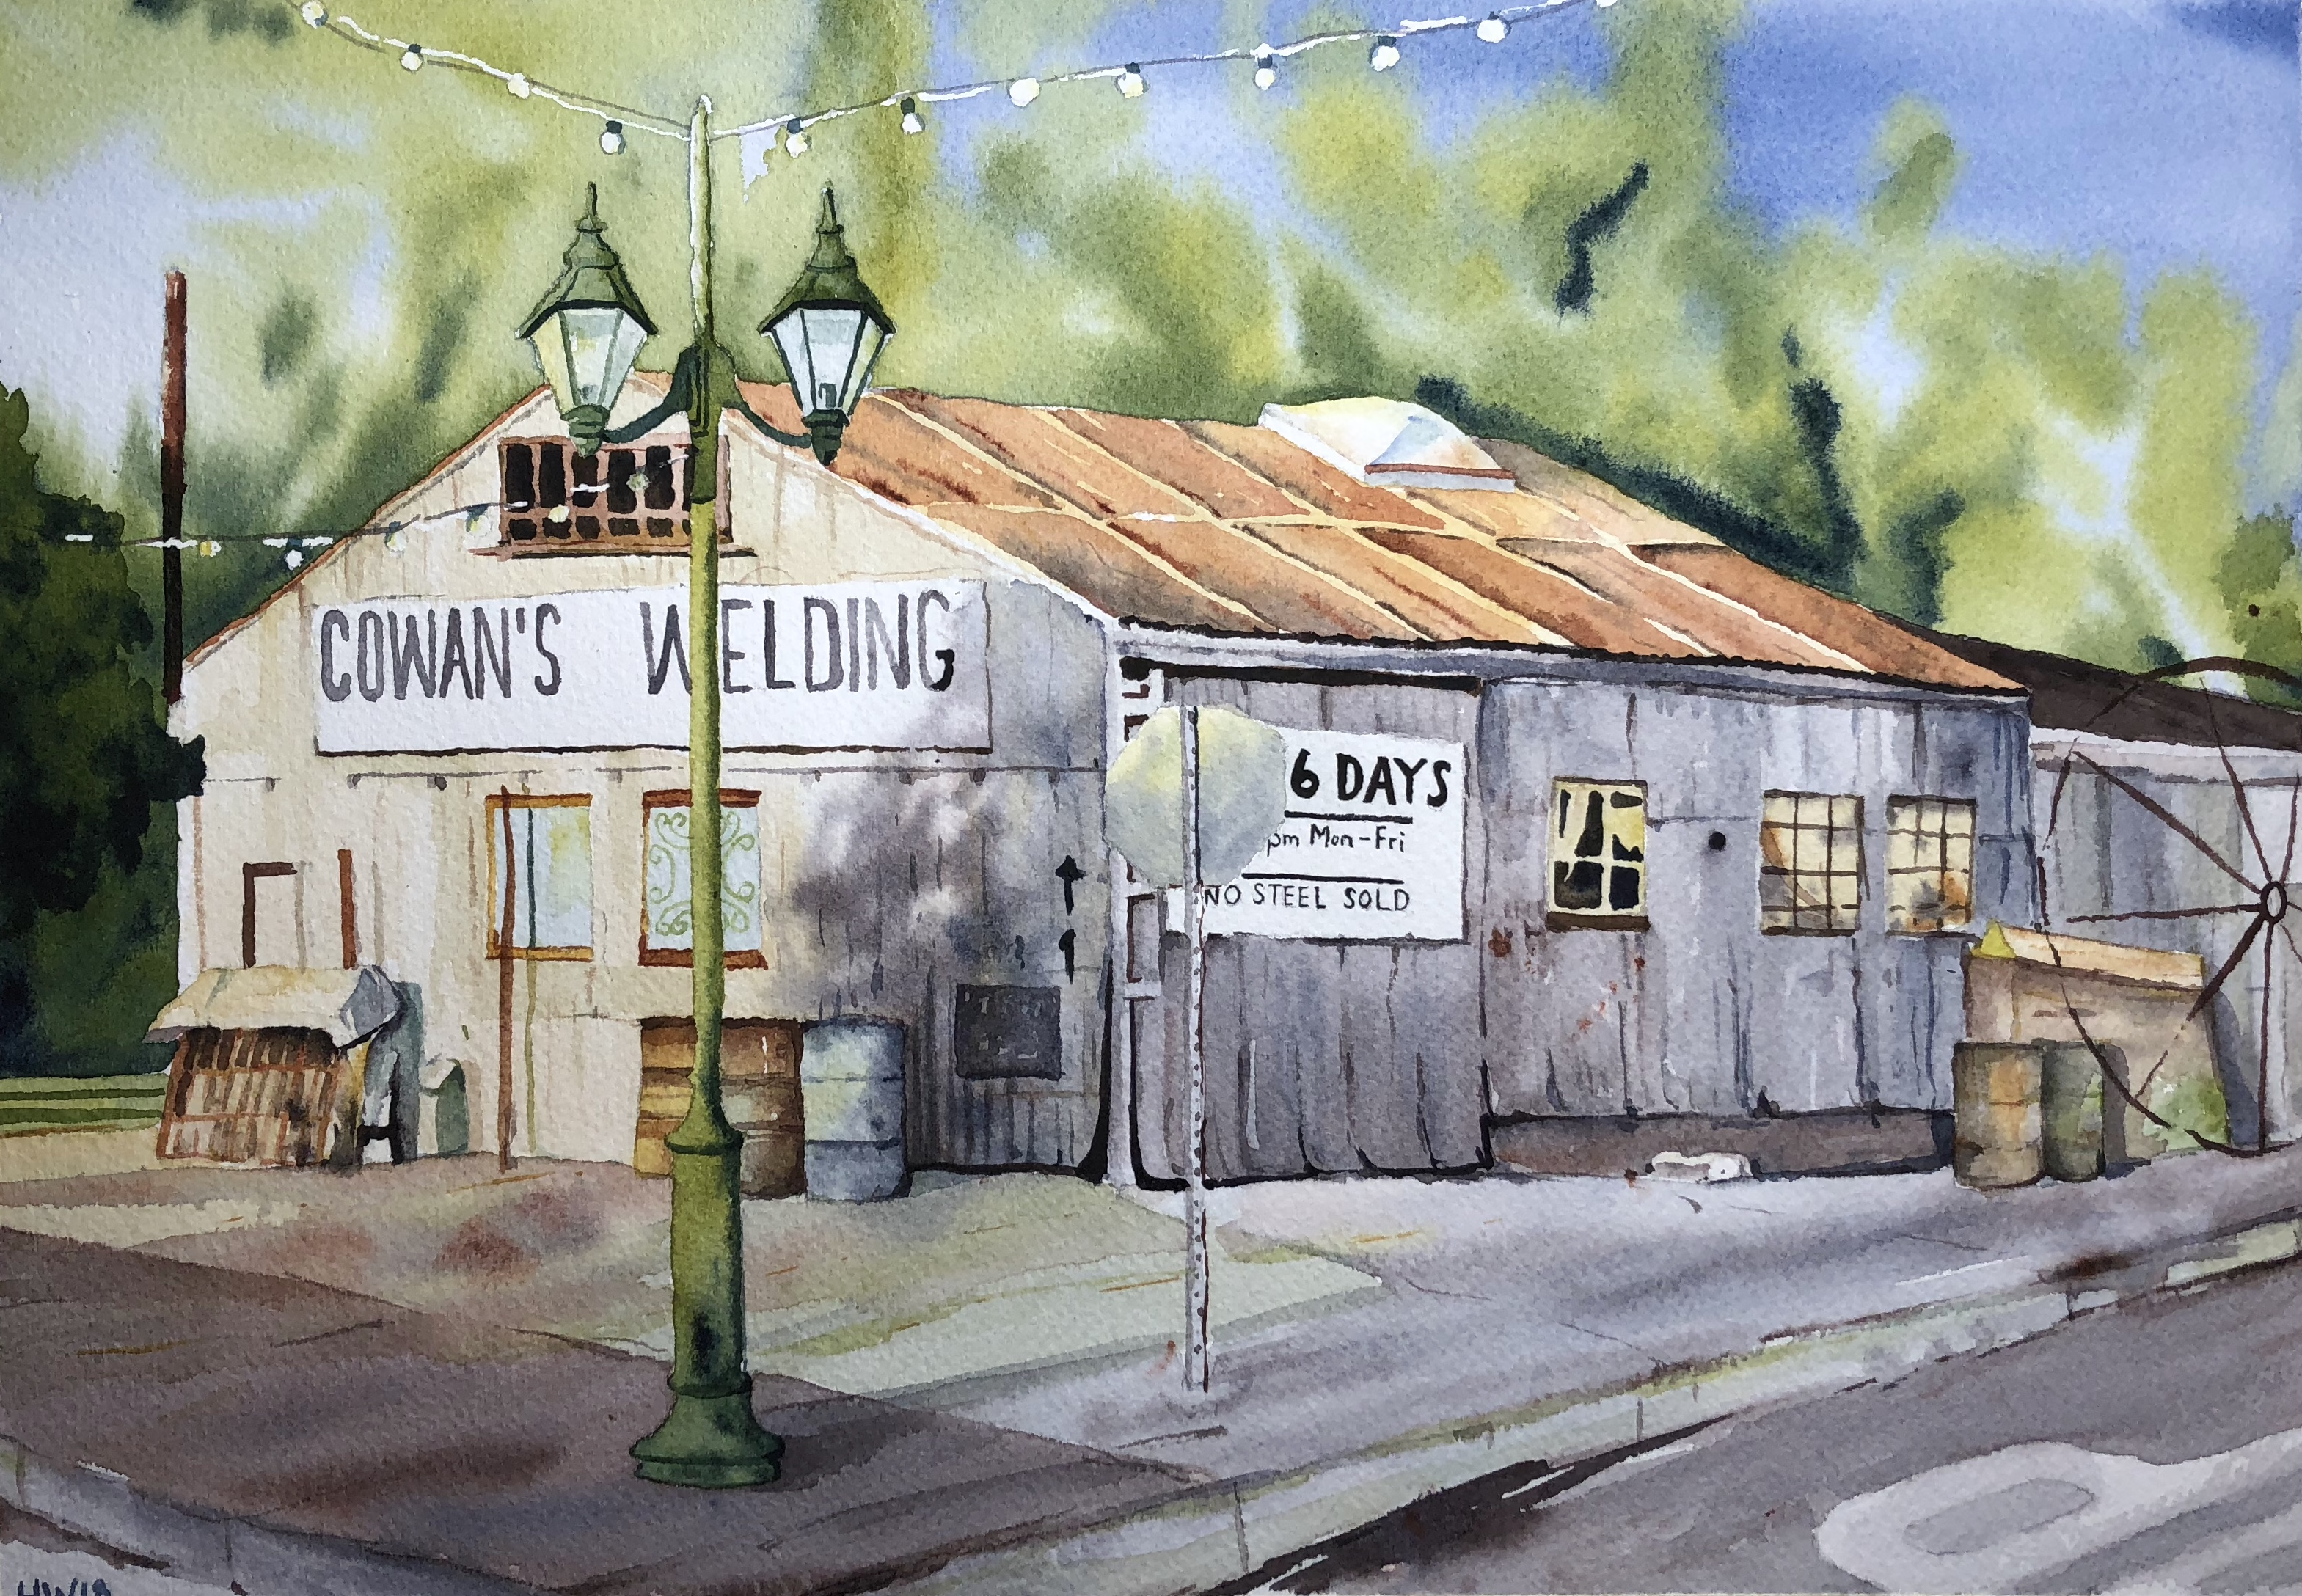 Cowan's Welding Shop